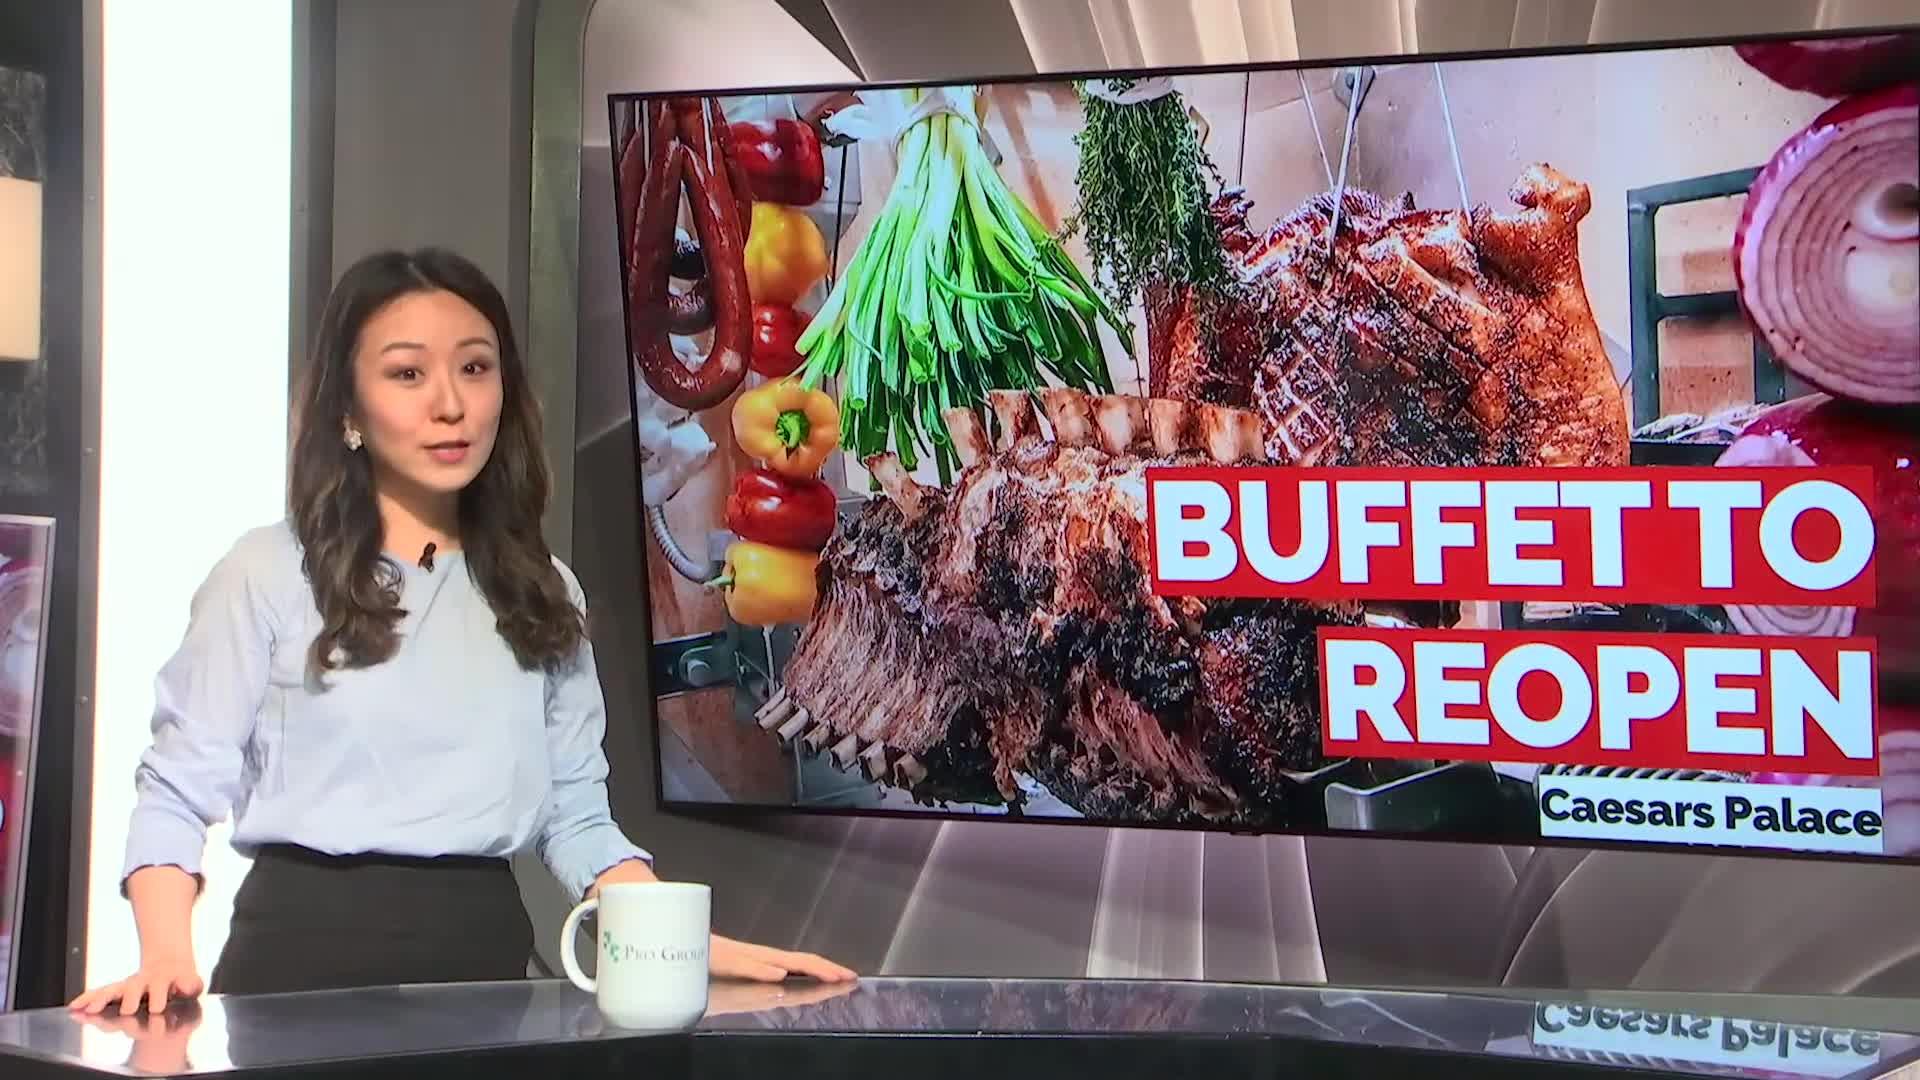 7@7PM Buffet Set to Reopen at Caesars Palace